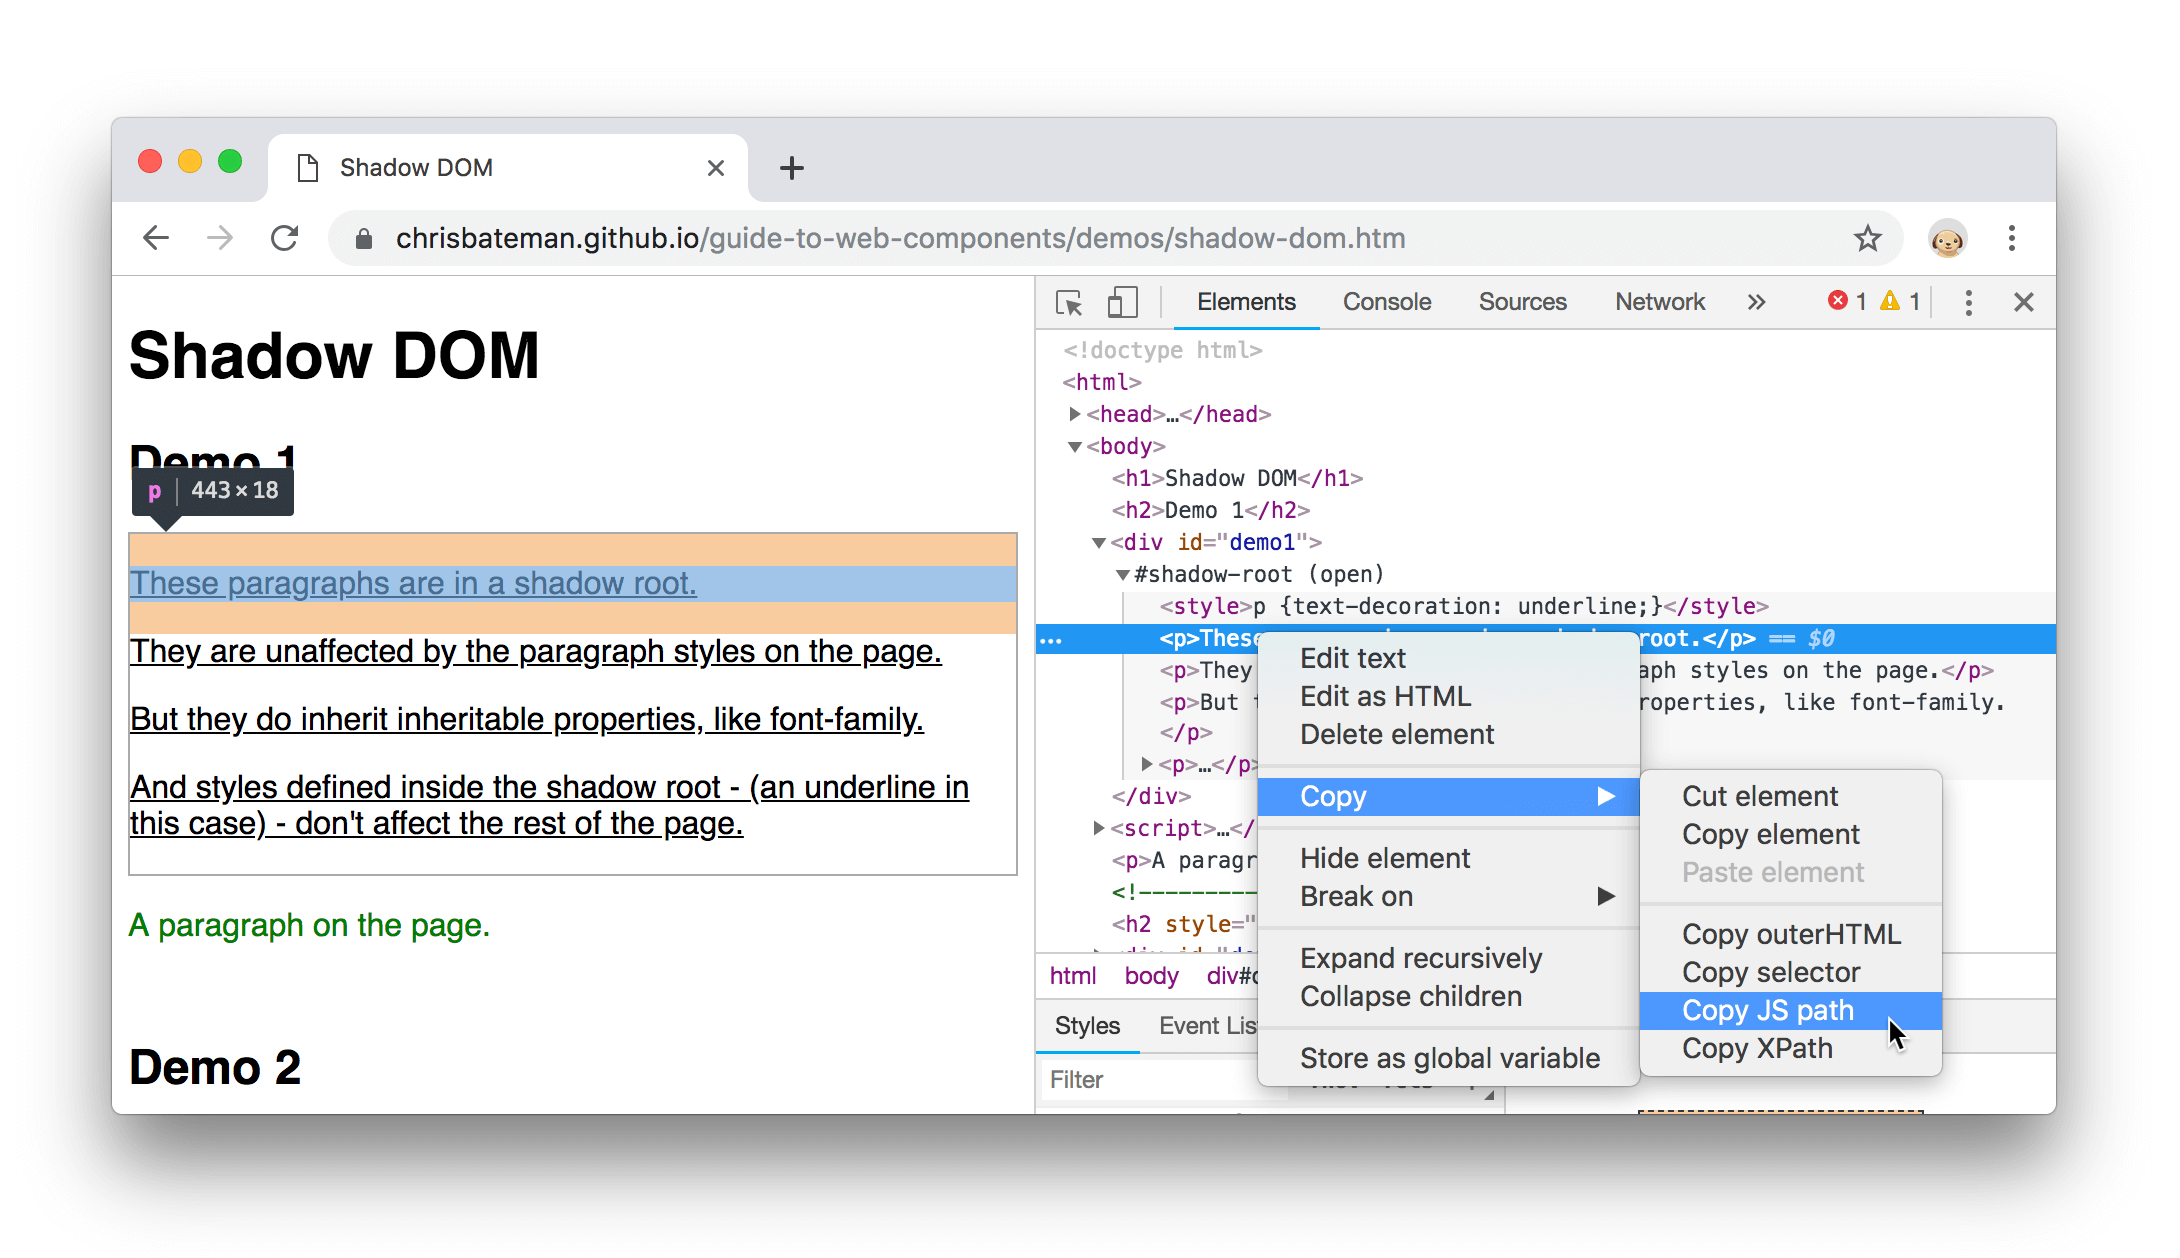 Copy JS path